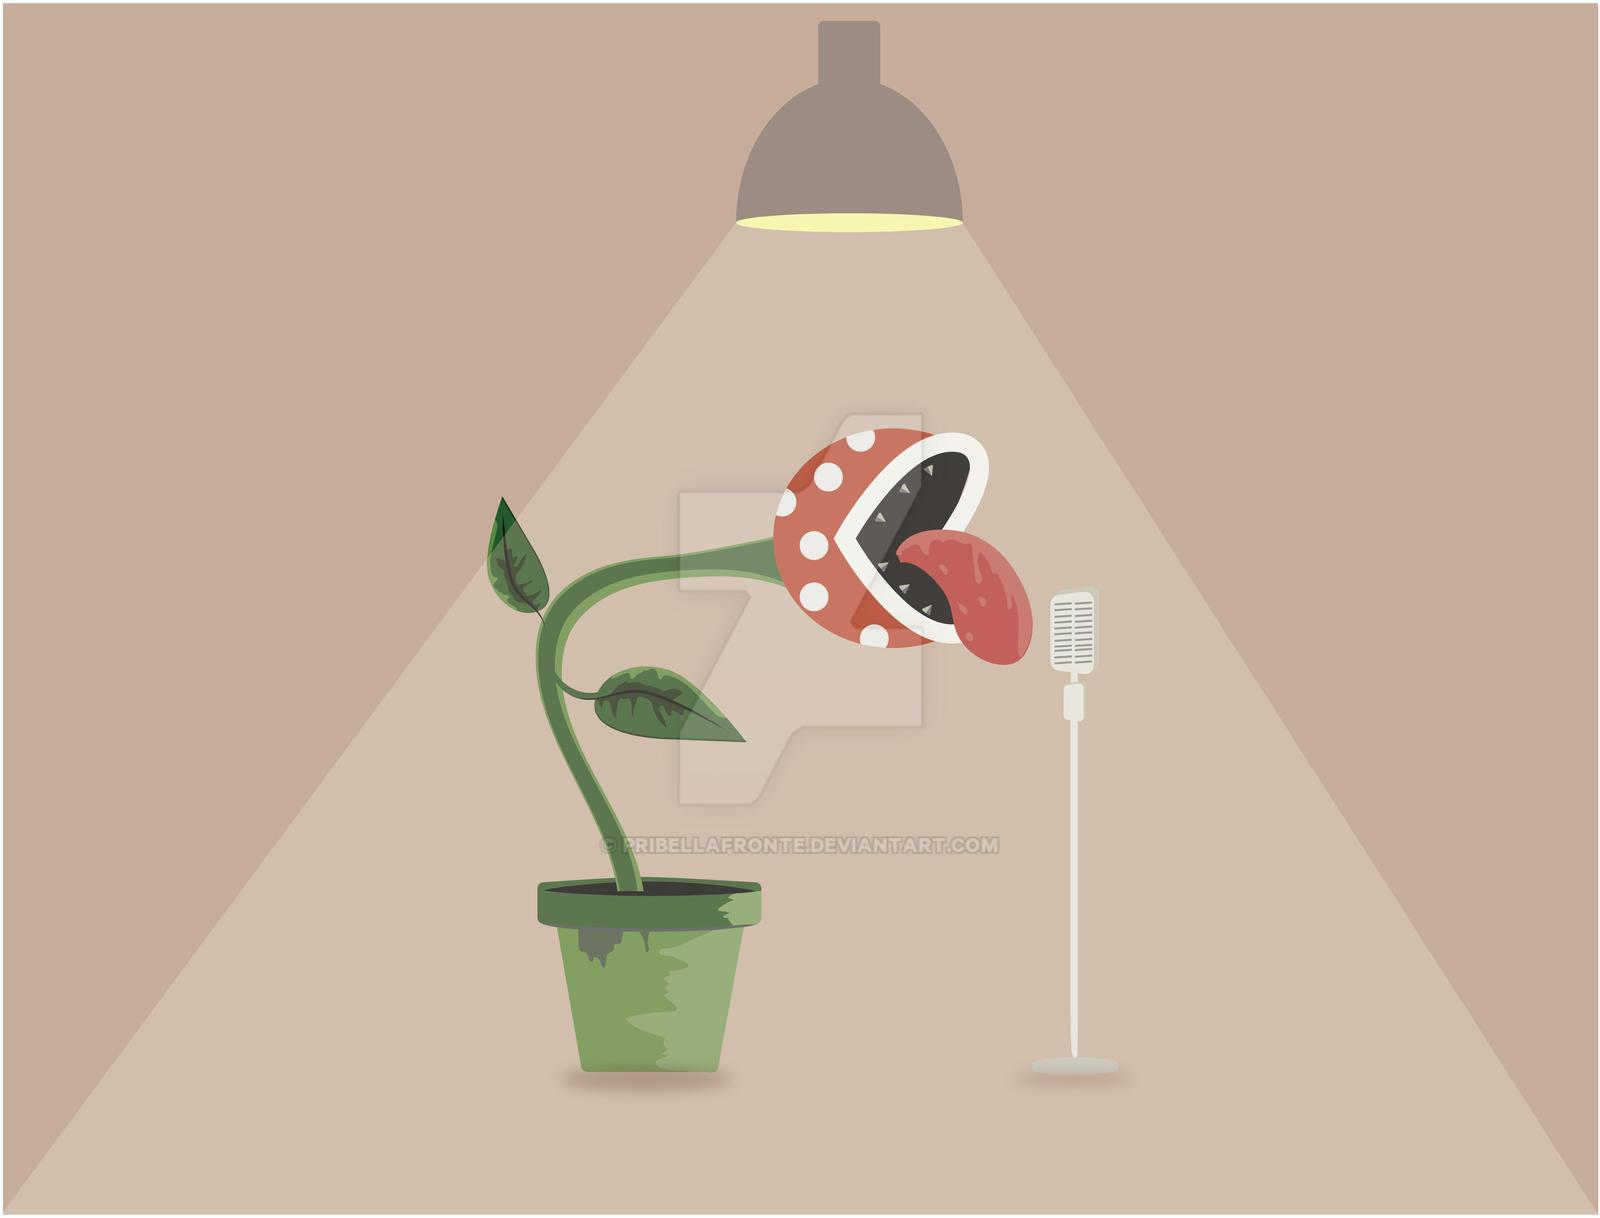 Mario - Piranha Plant singing by pribellafronte